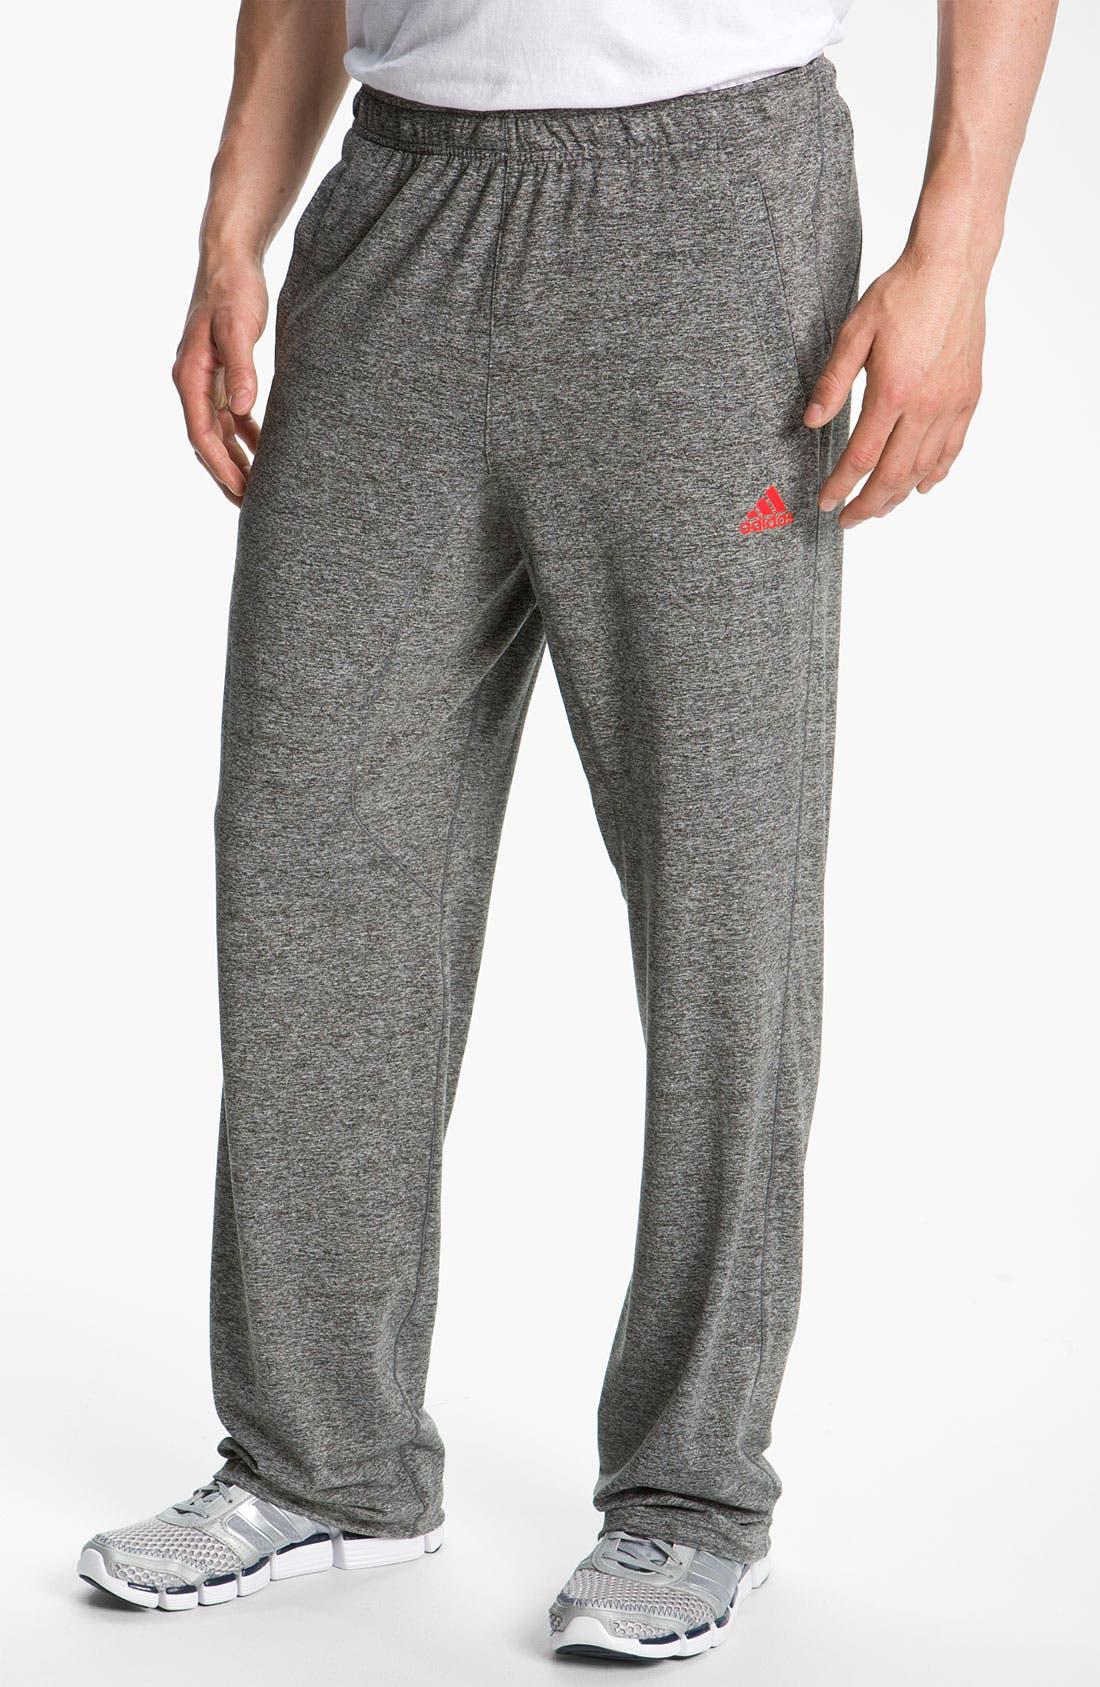 Alternate Image 1 Selected - adidas 'Elite' Pants